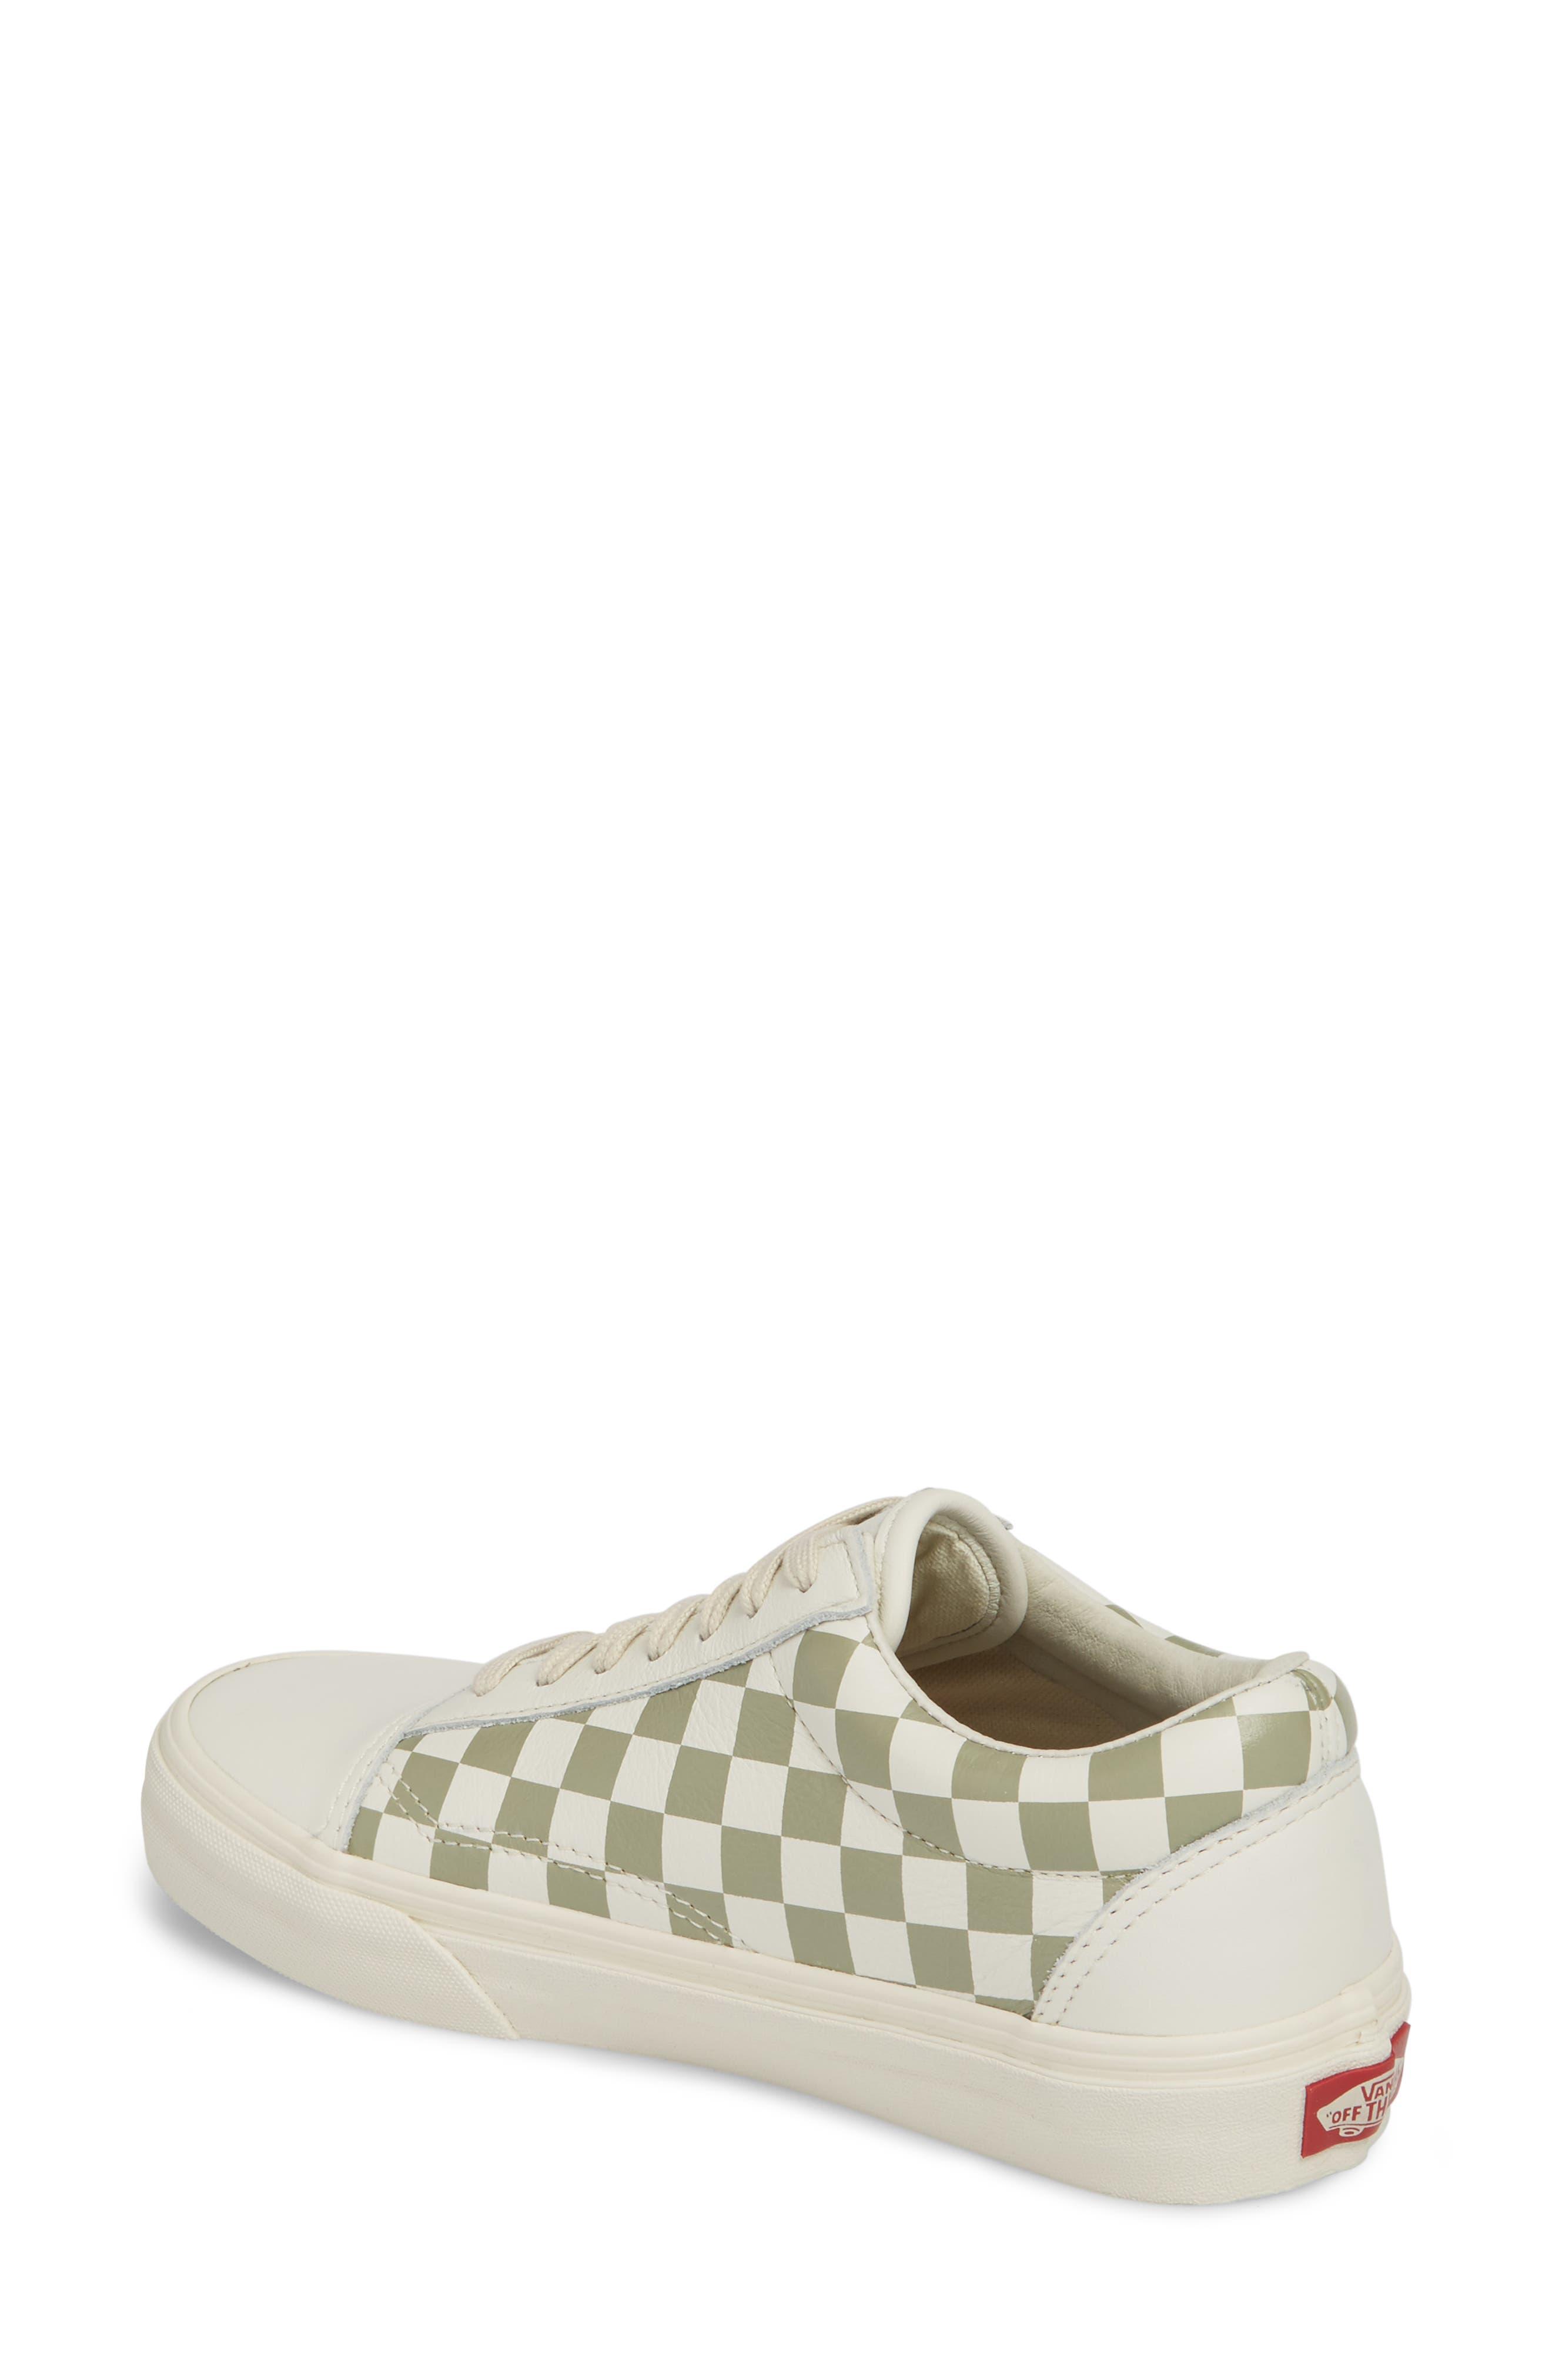 Old Skool 36 DX Sneaker,                             Alternate thumbnail 2, color,                             100